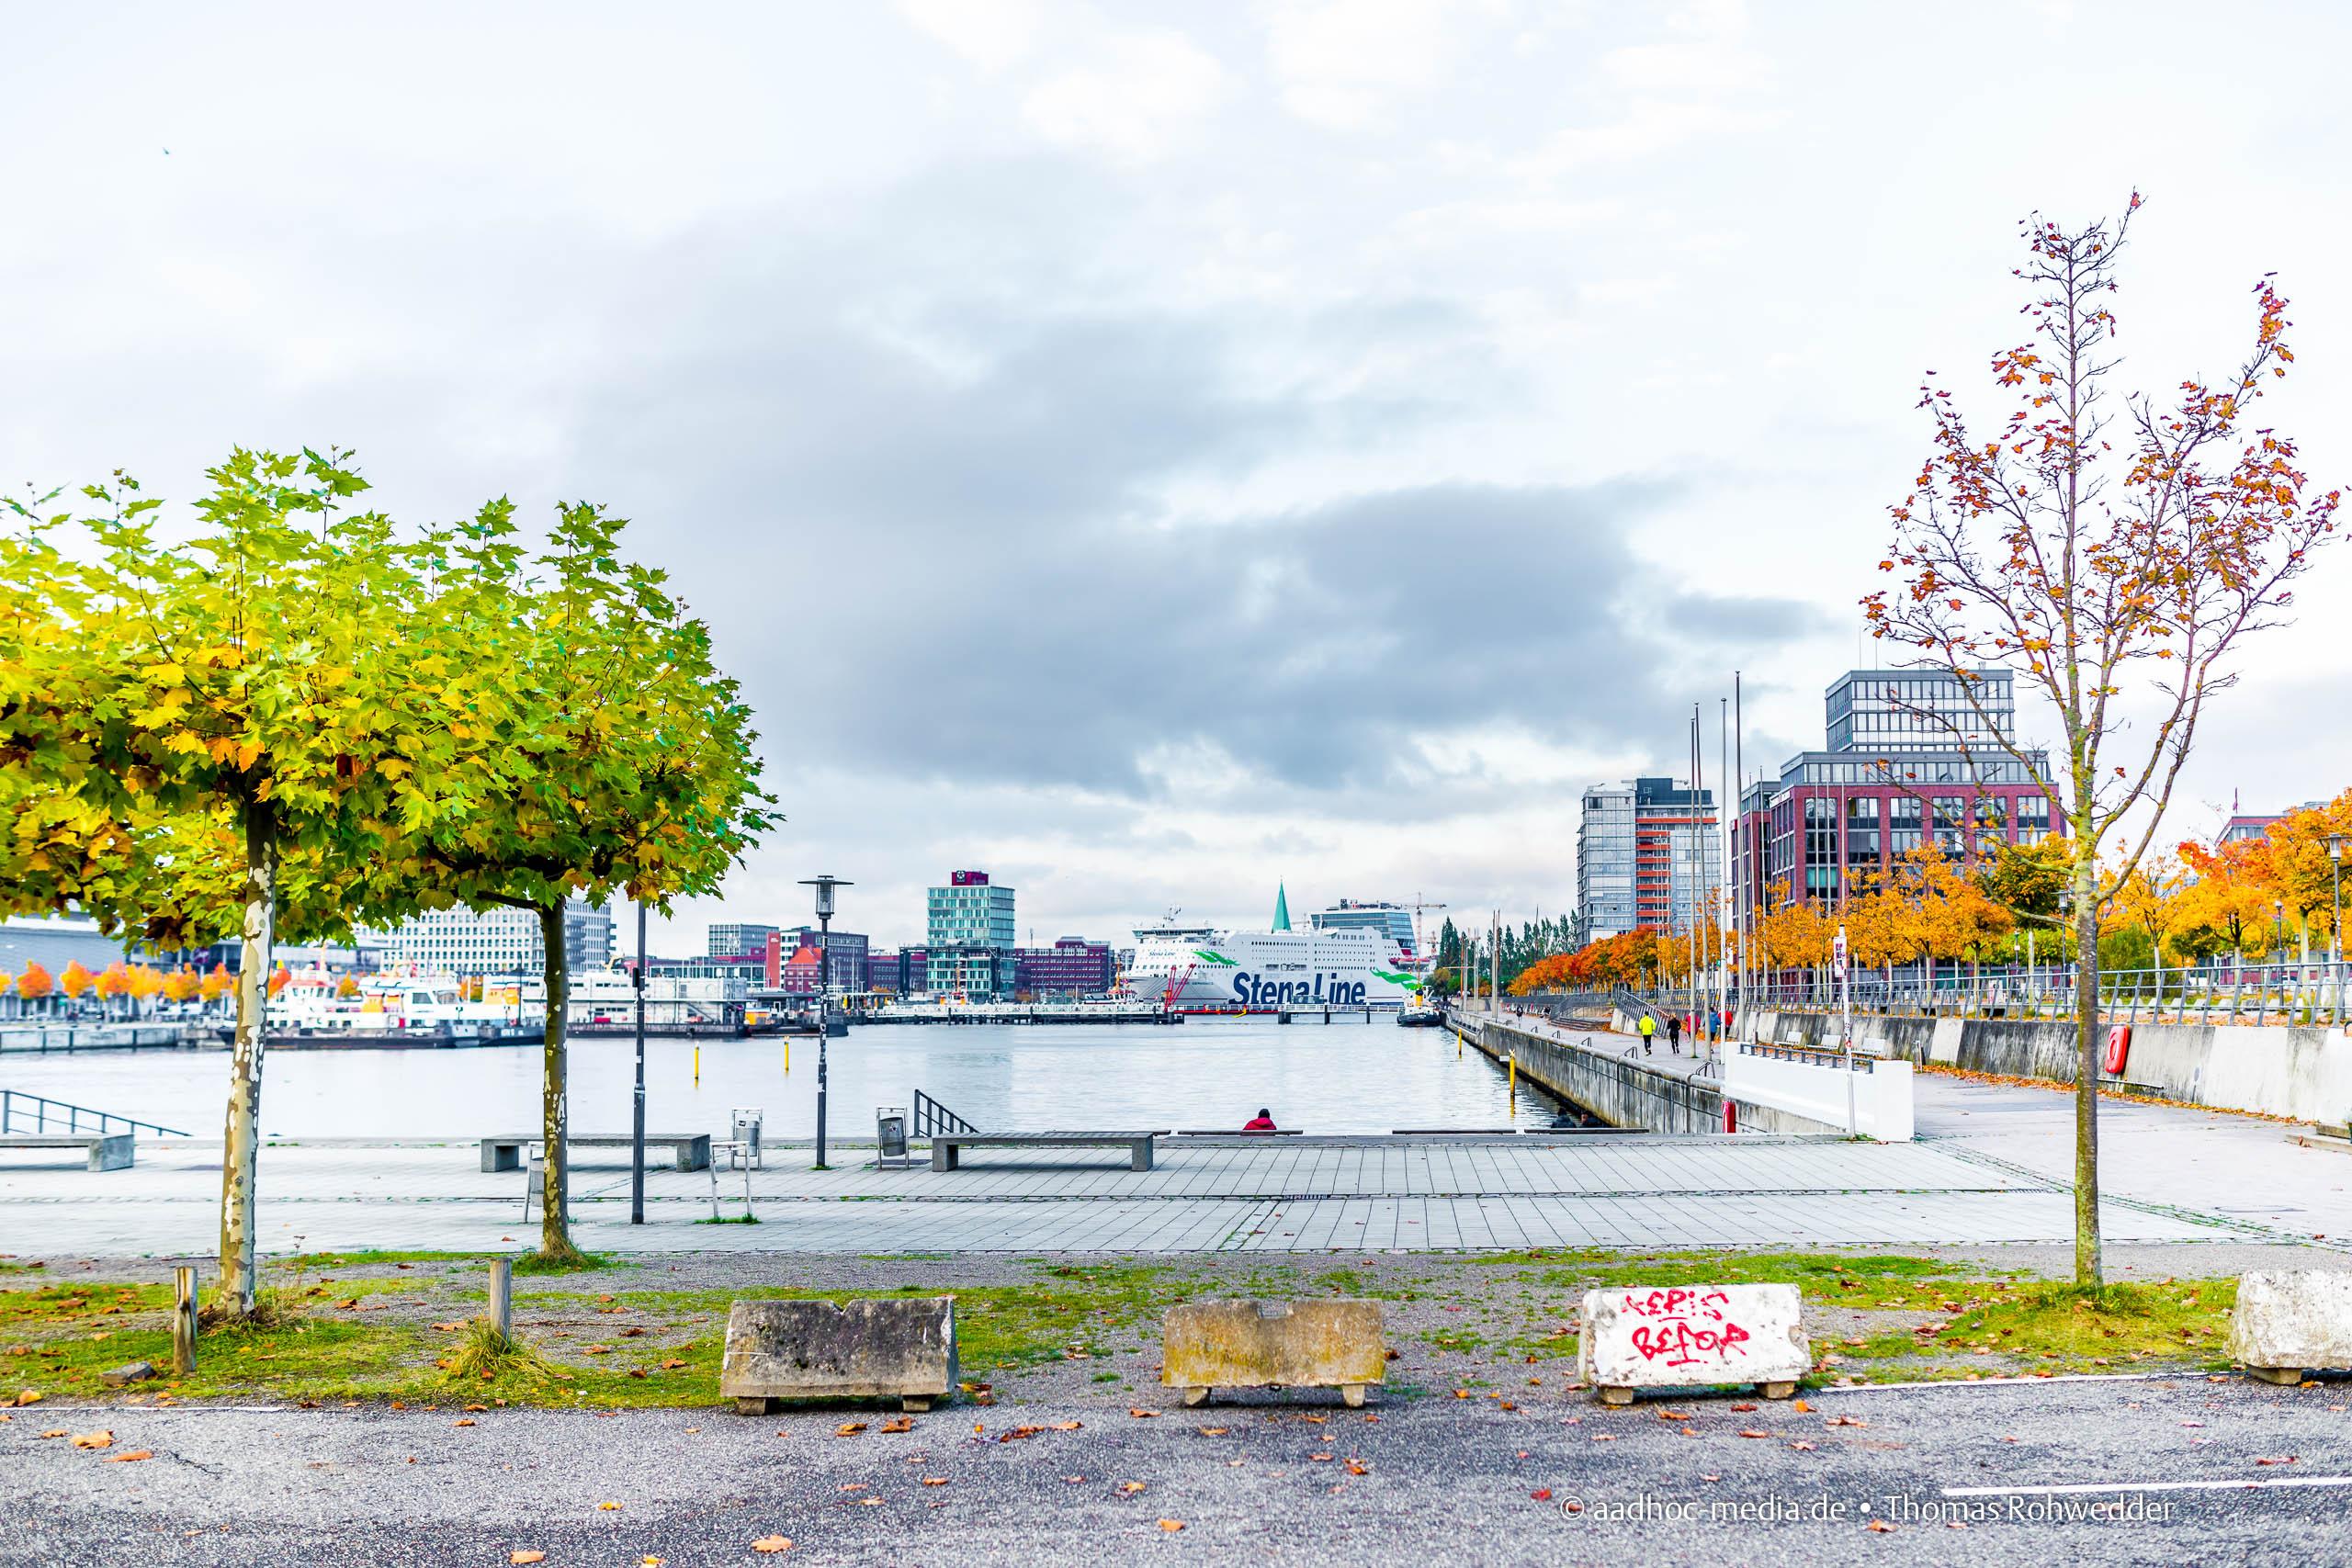 Kiel - Grau in Grau bei herstlichen Bäumen • ©Foto: aadhoc-media.de • Thomas Rohwedder